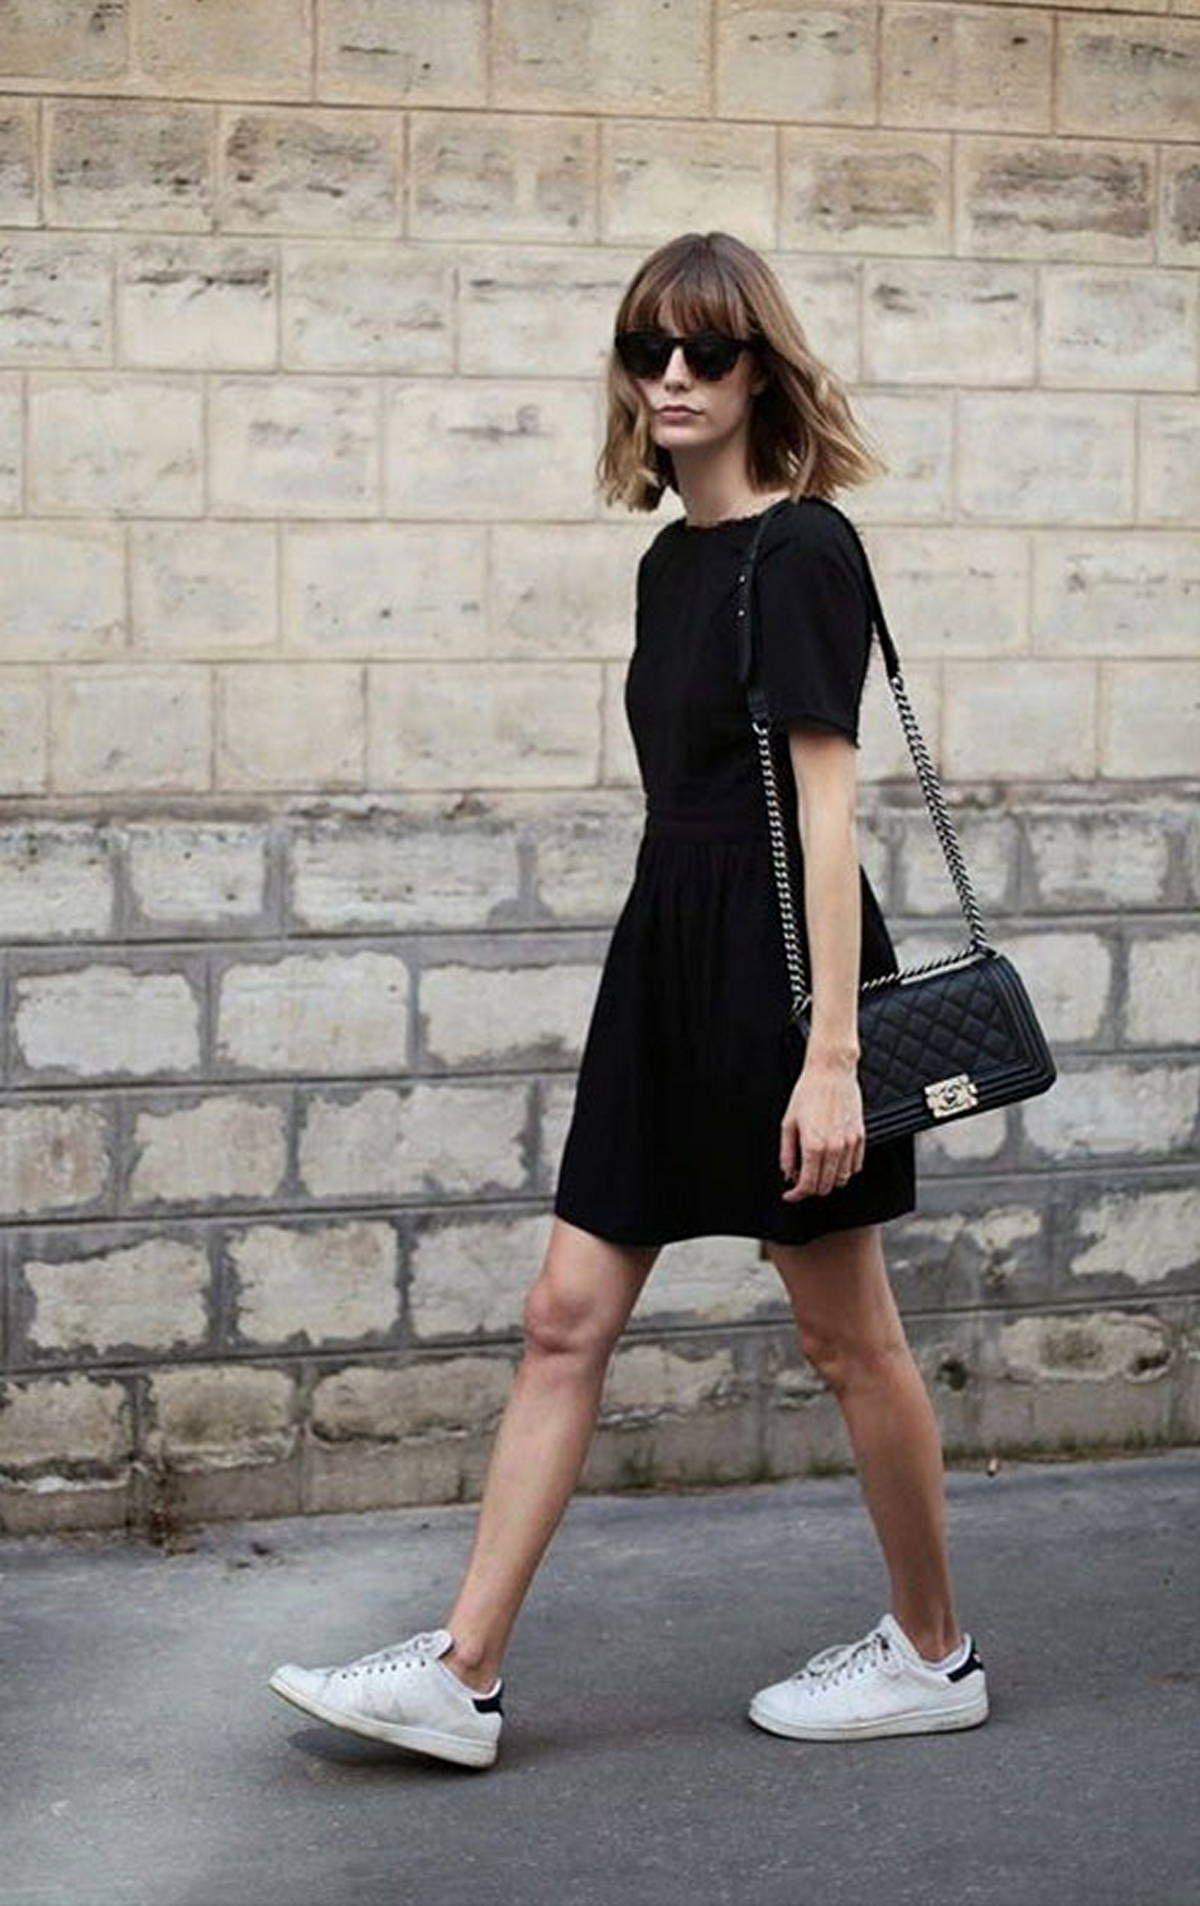 112 Women S White Sneakers Outfit Idea Dressfitme Dress And Sneakers Outfit Black Dresses Casual Wear Black Dresses [ 1906 x 1200 Pixel ]